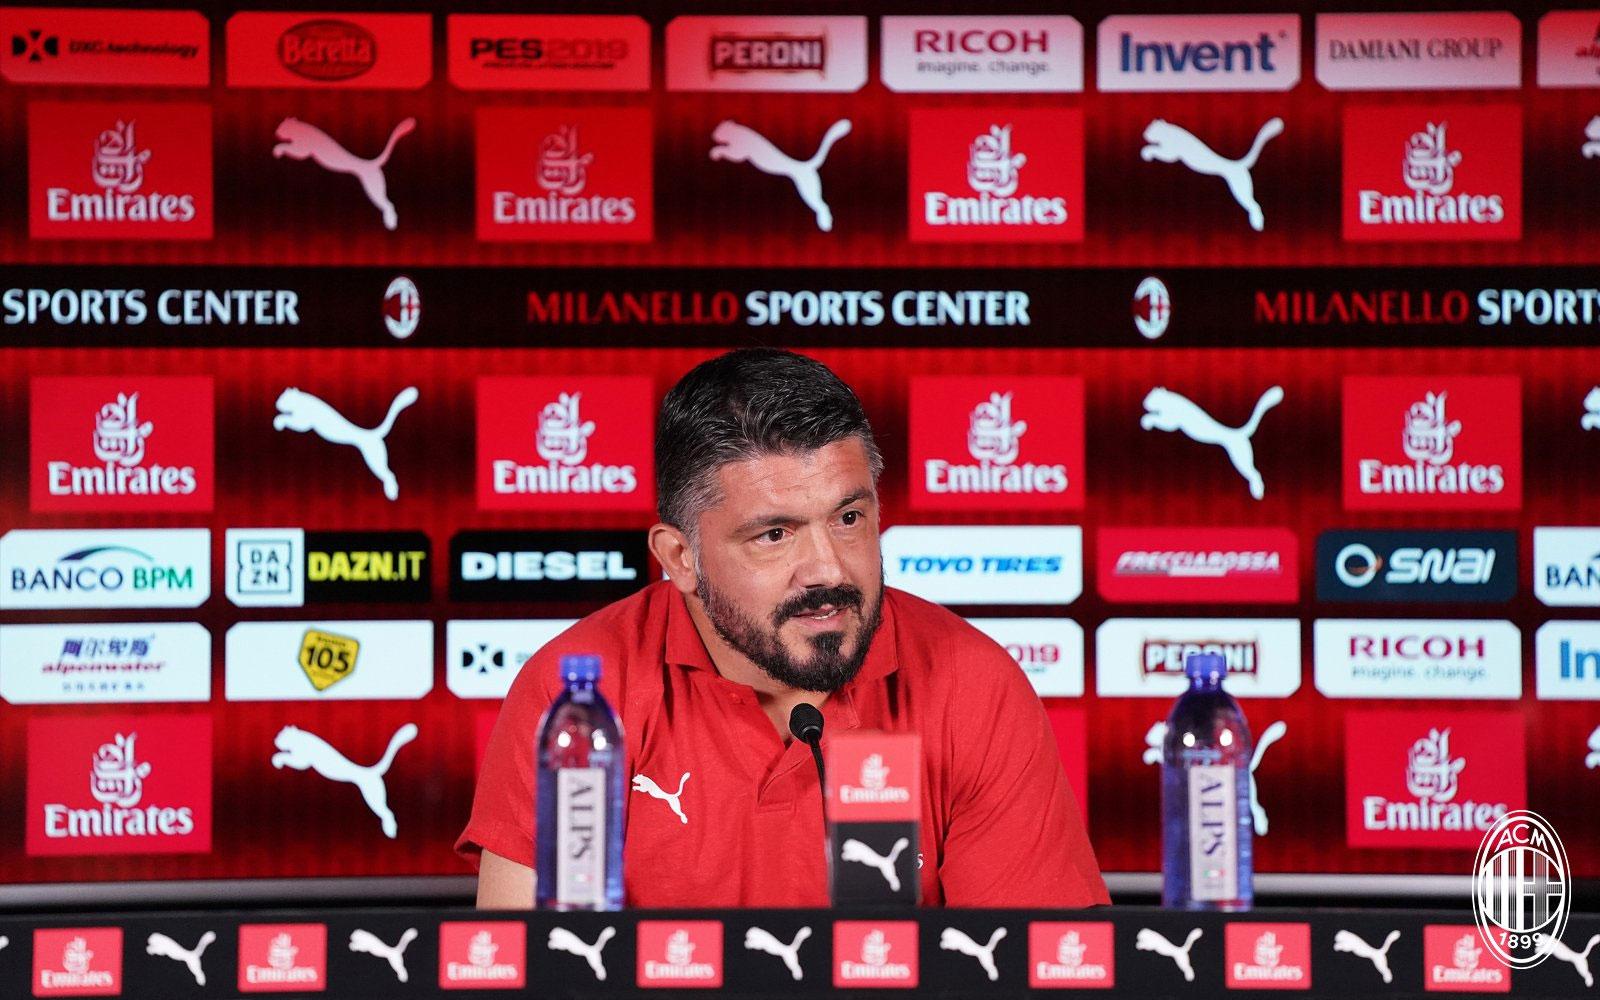 Gennaro Gattuso during a press conference at training center Milanello. (@acmilan.com)